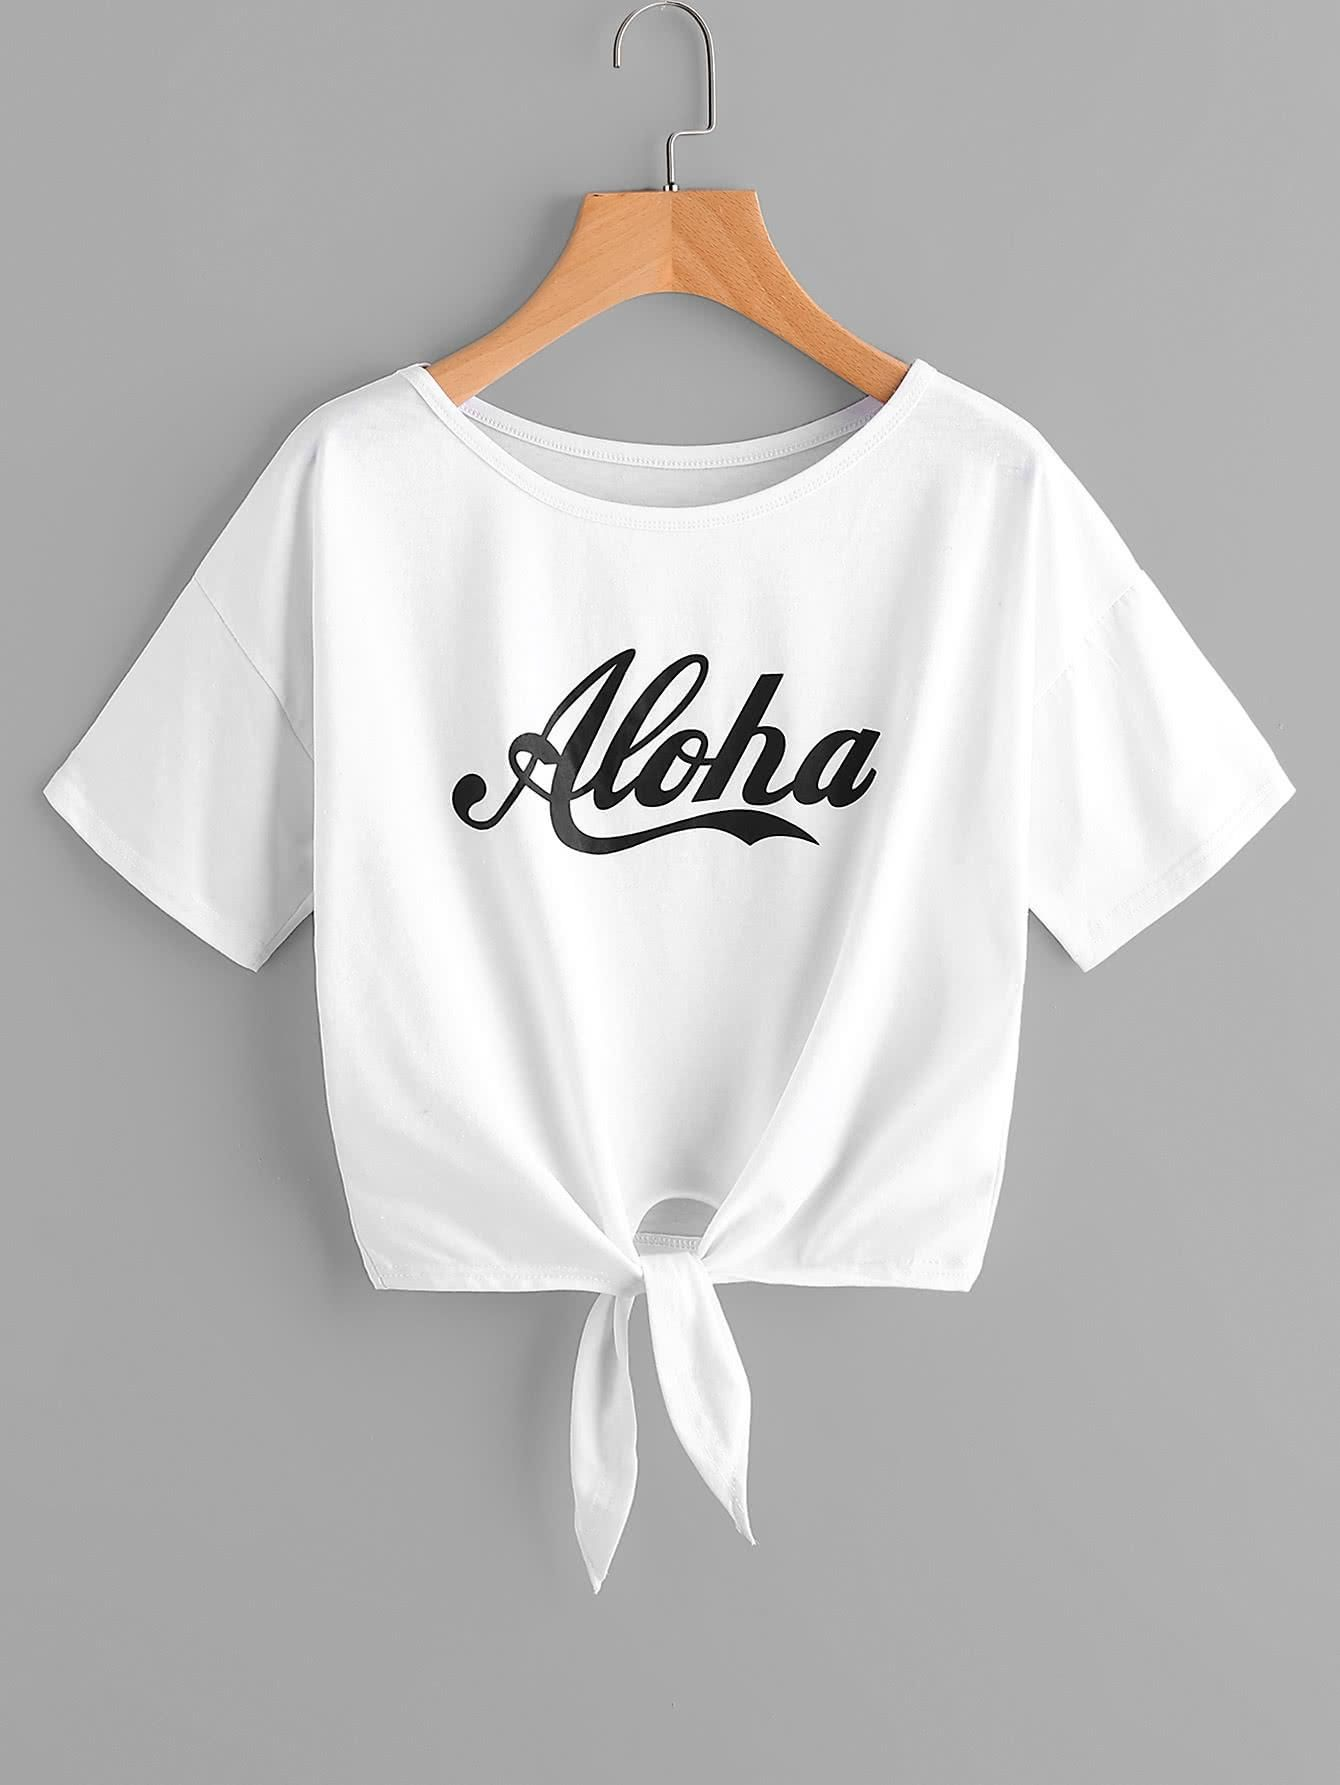 Romwe Shirts For Girls